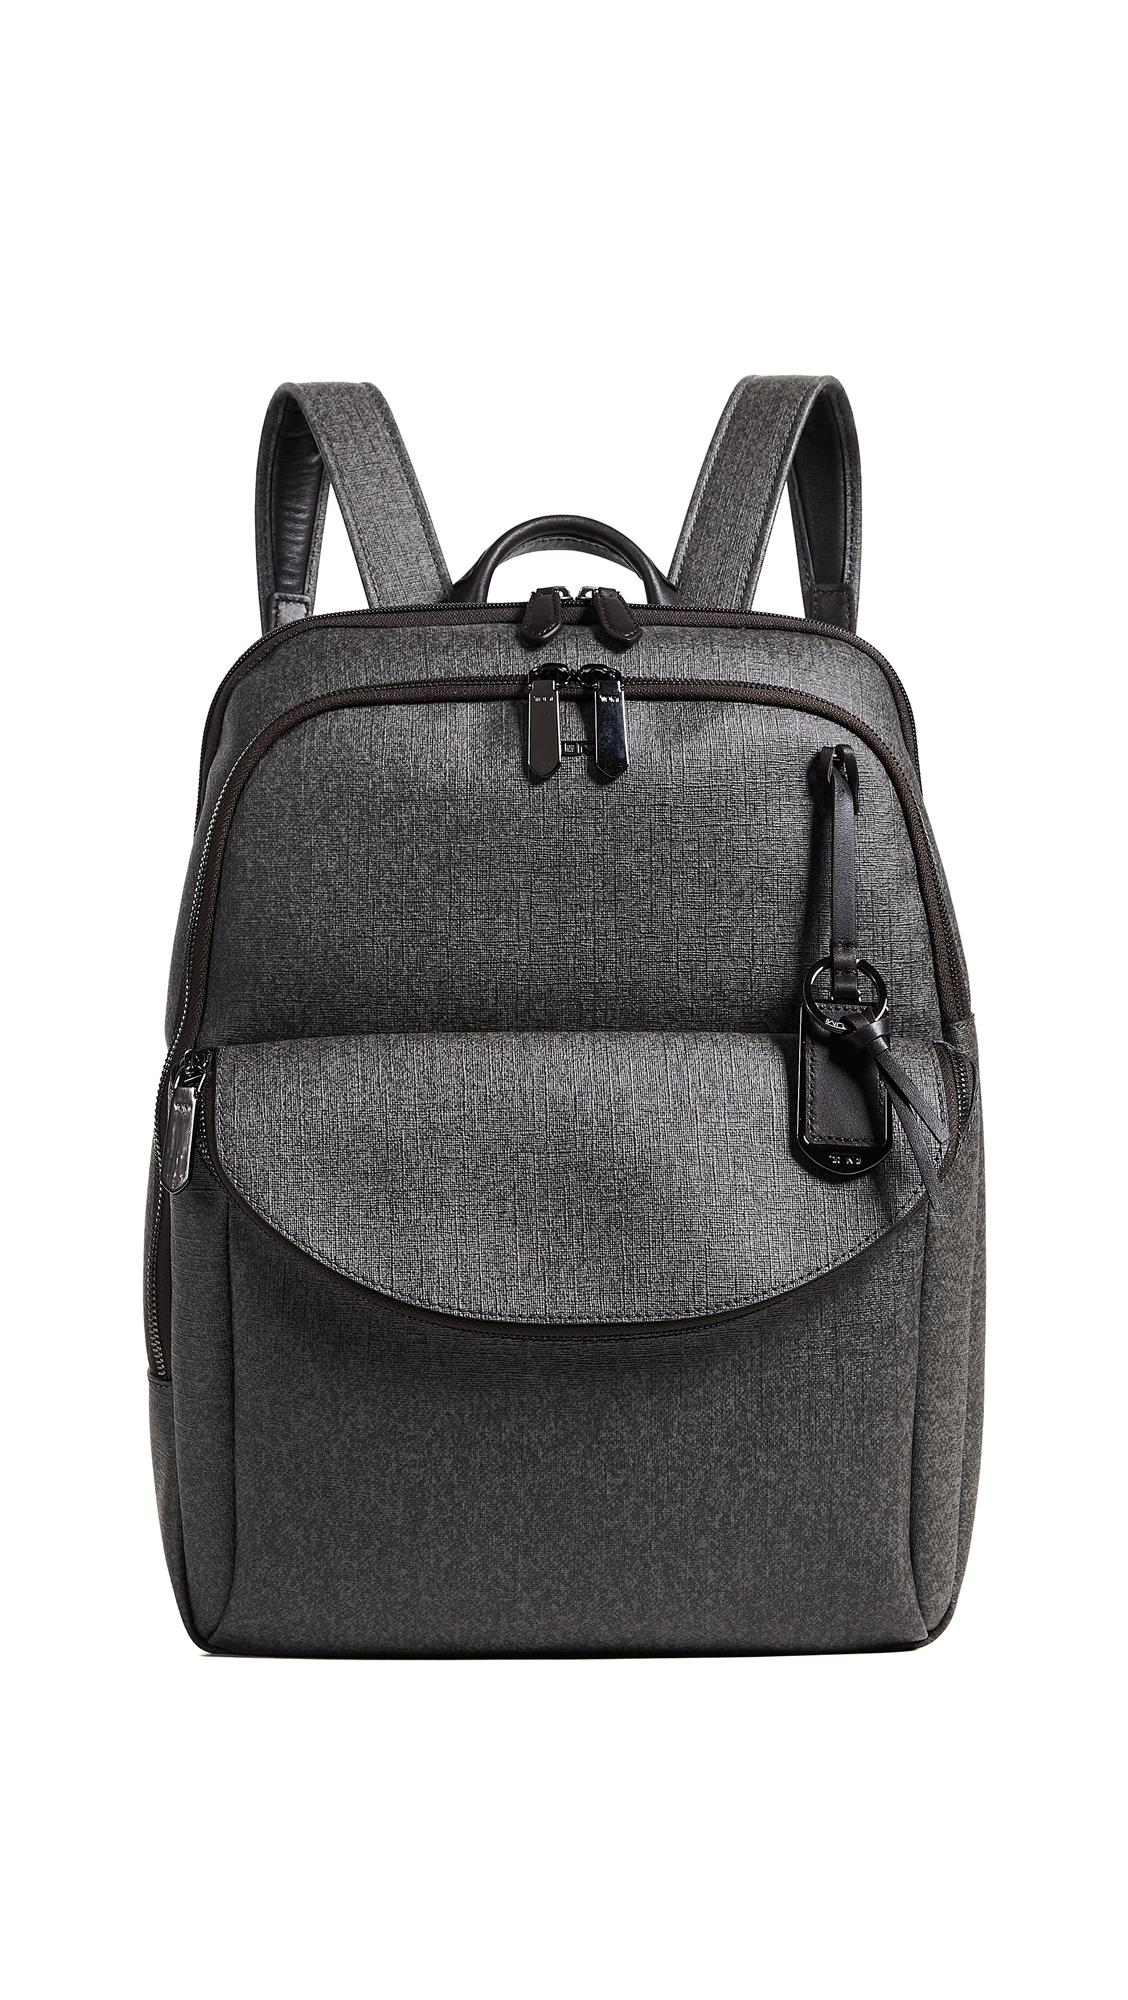 Tumi Hettie Backpack - Earl Grey